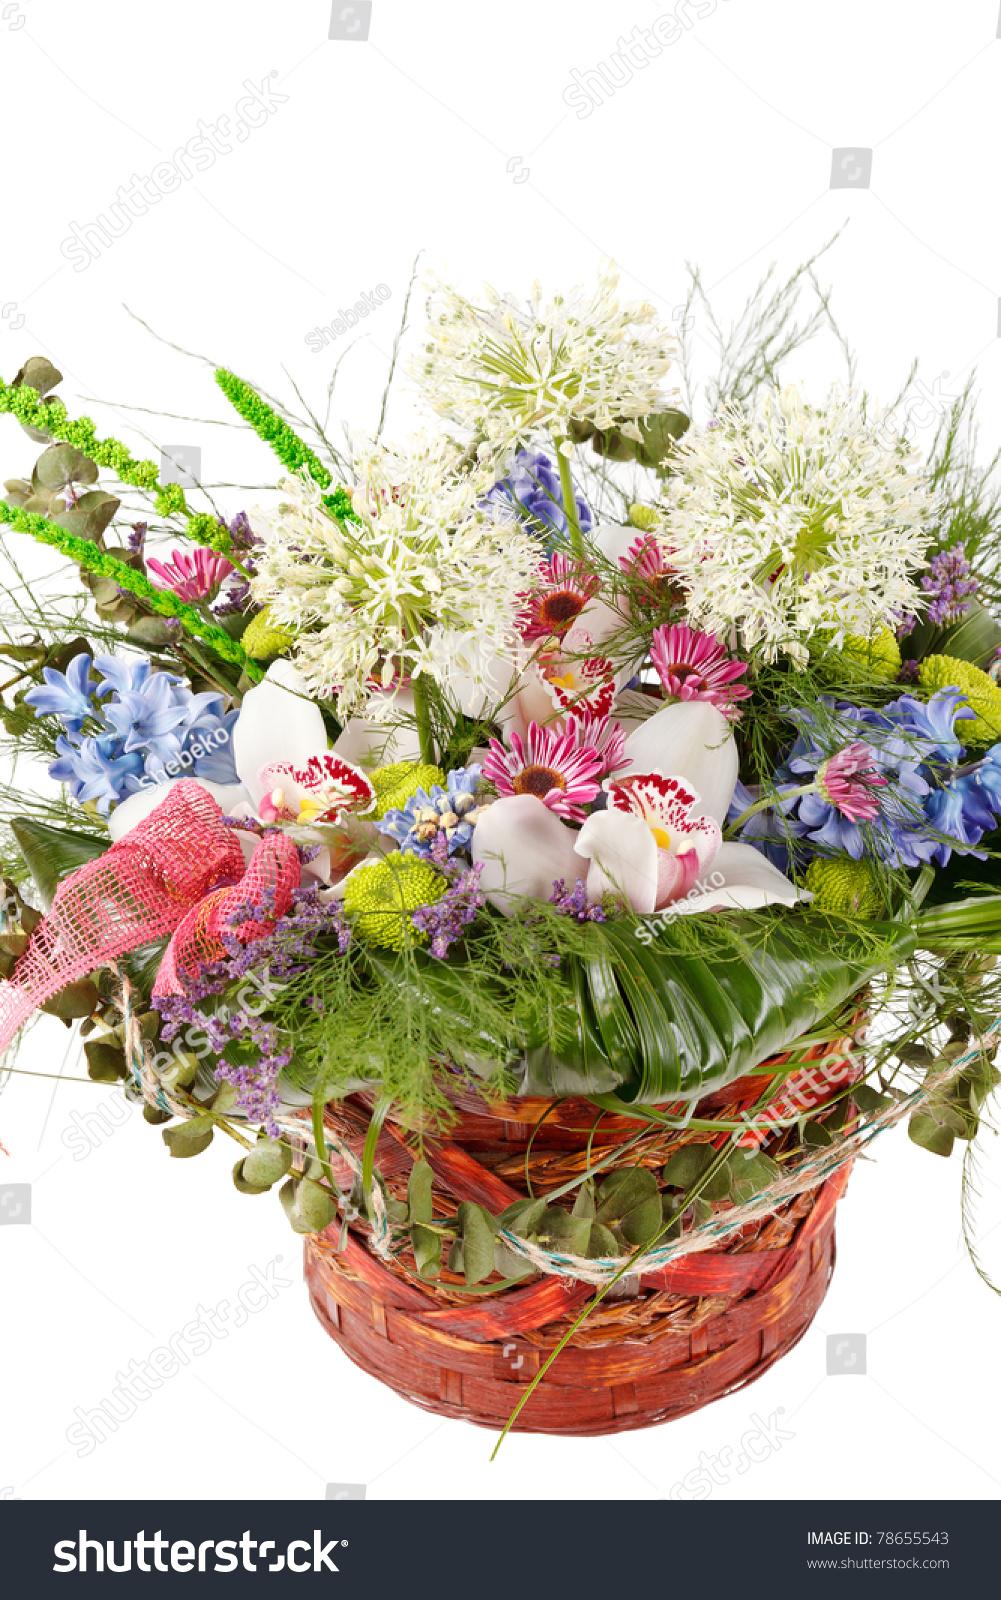 Colorful beautiful flowers basket photo wedding and flowers beautiful flowers basket images flower wallpaper hd izmirmasajfo